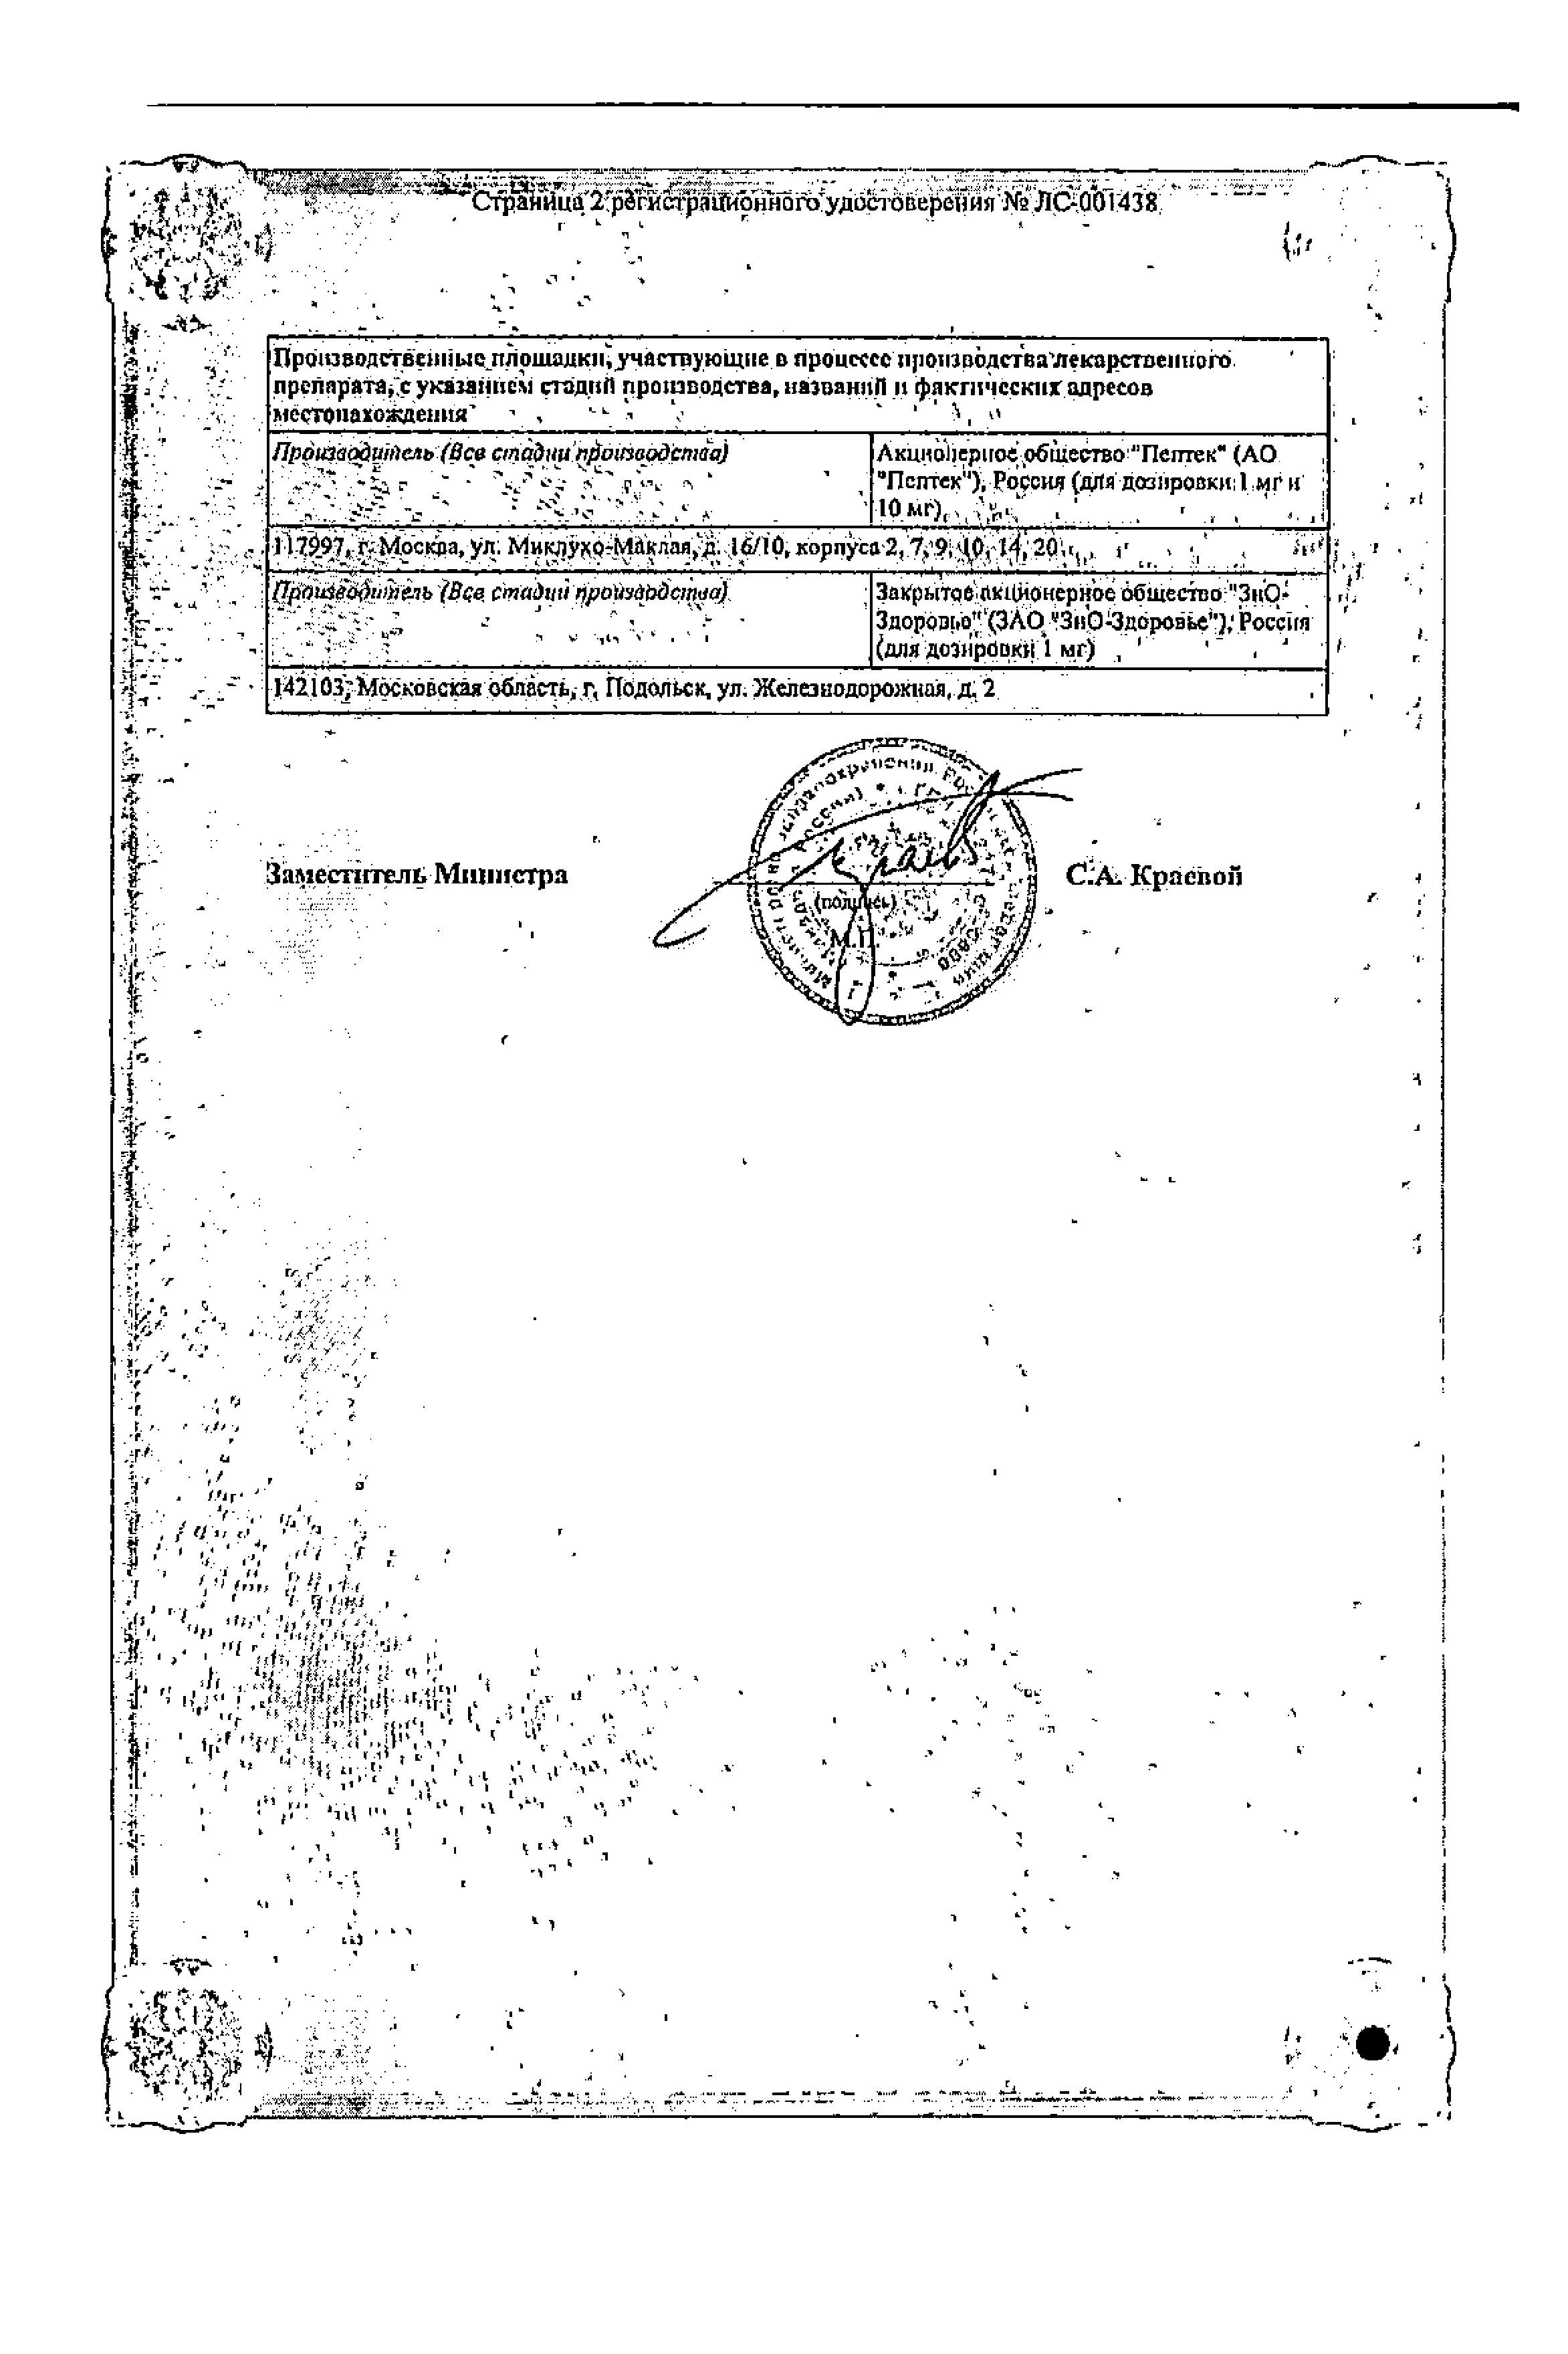 Ликопид